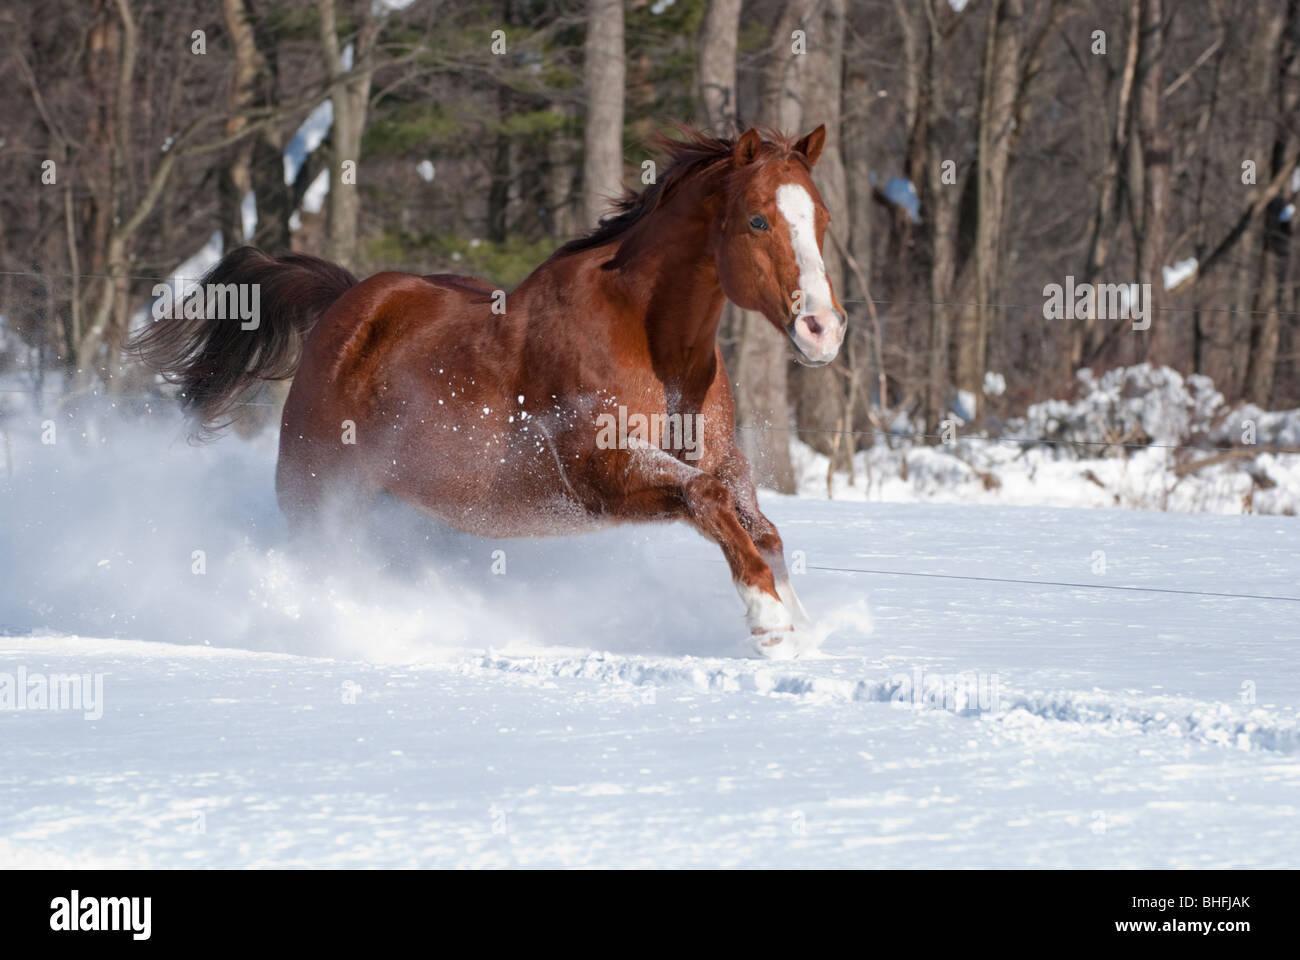 Picture of quarter horse gelding running in sunlight in new fallen snow. - Stock Image